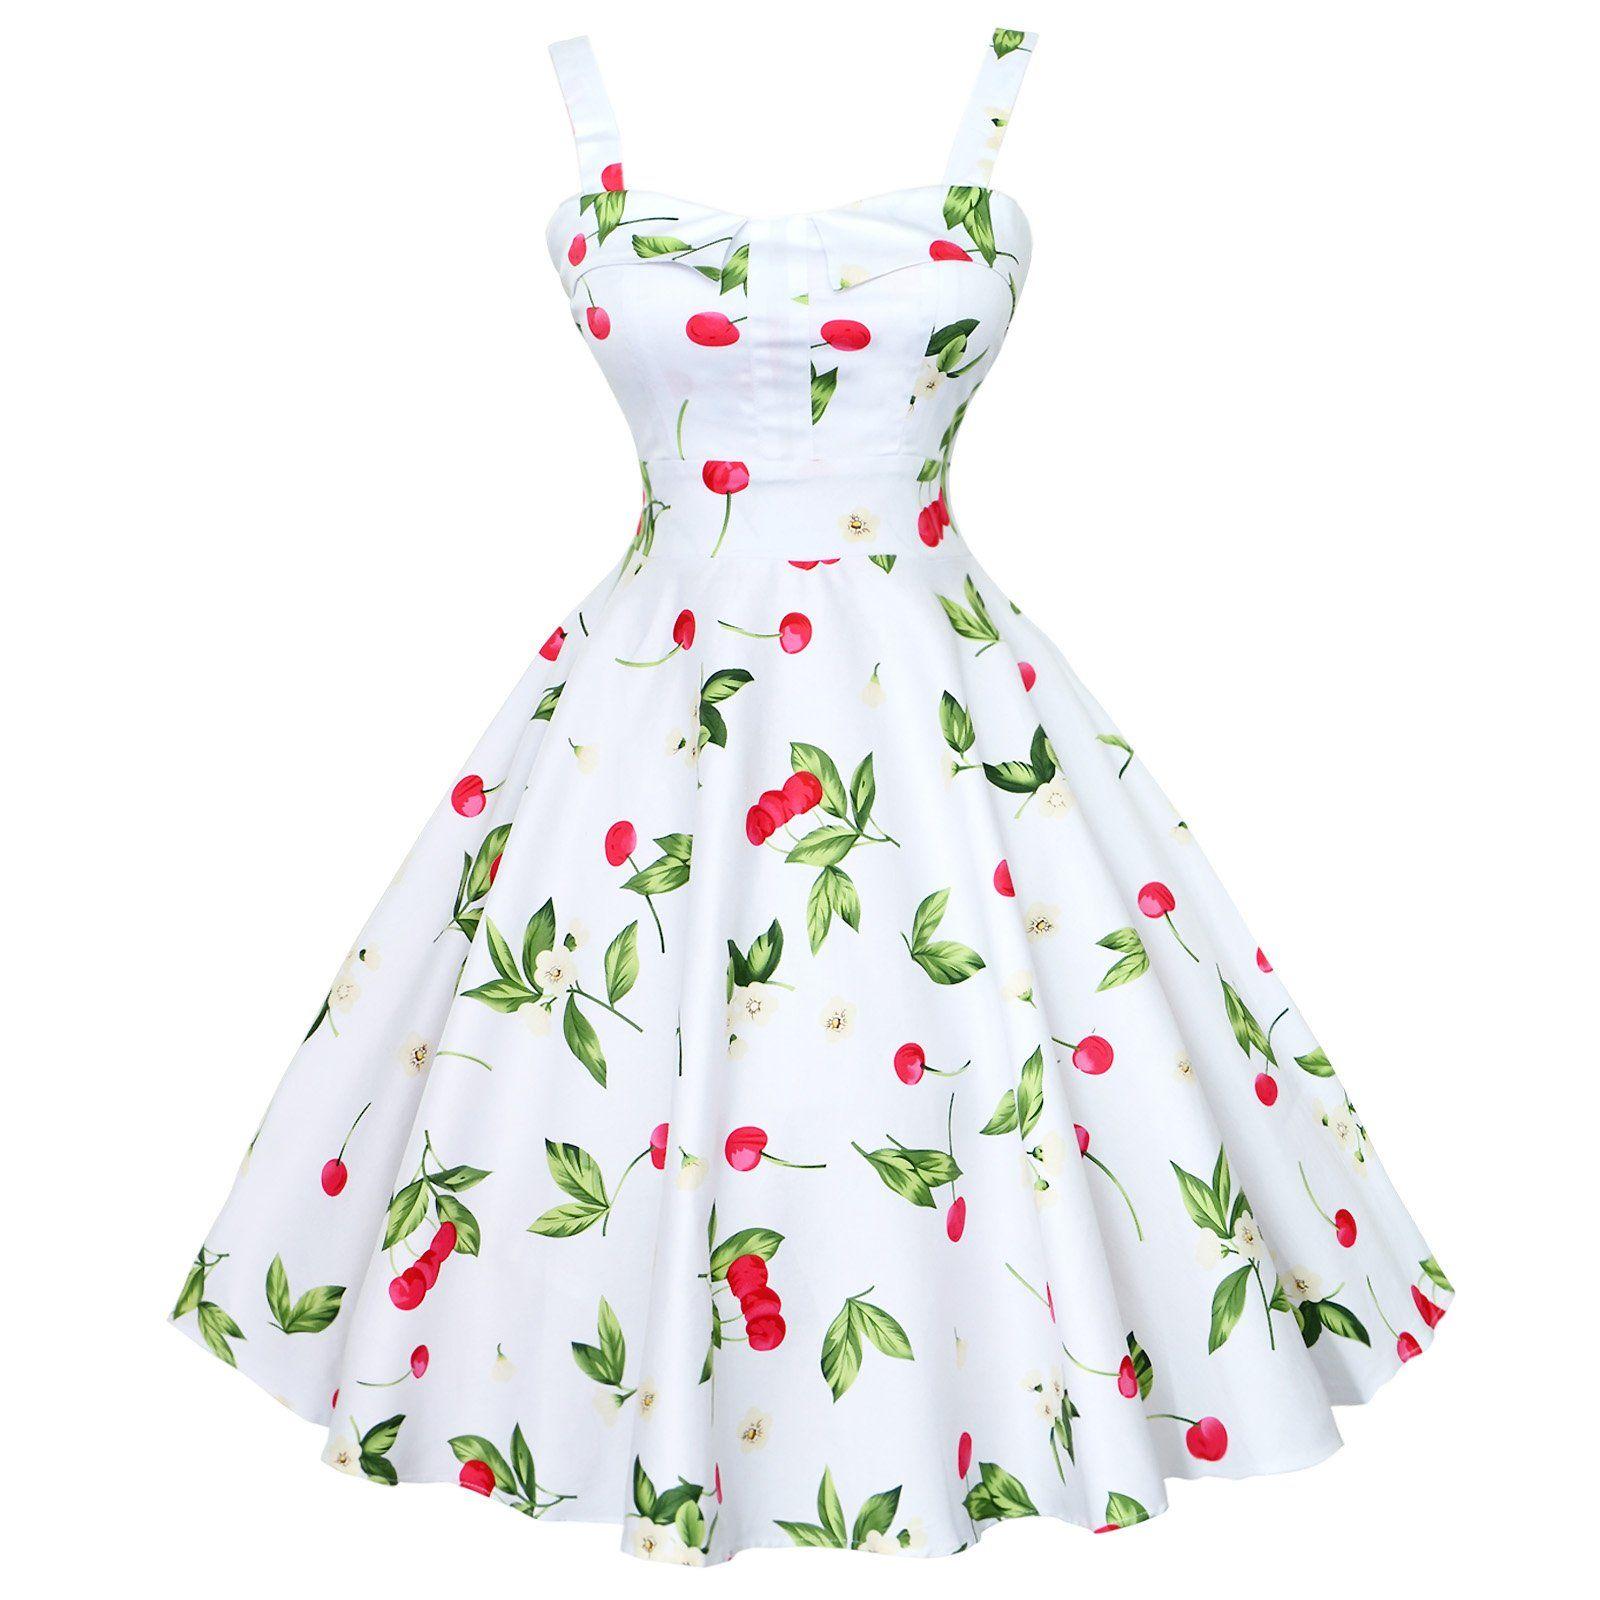 Maggie Tang Women S 1950s Vintage Rockabilly Dress Size S Color White Cherry Vintage Rockabilly Dress White Vintage Dress Vintage Dresses [ 1600 x 1600 Pixel ]